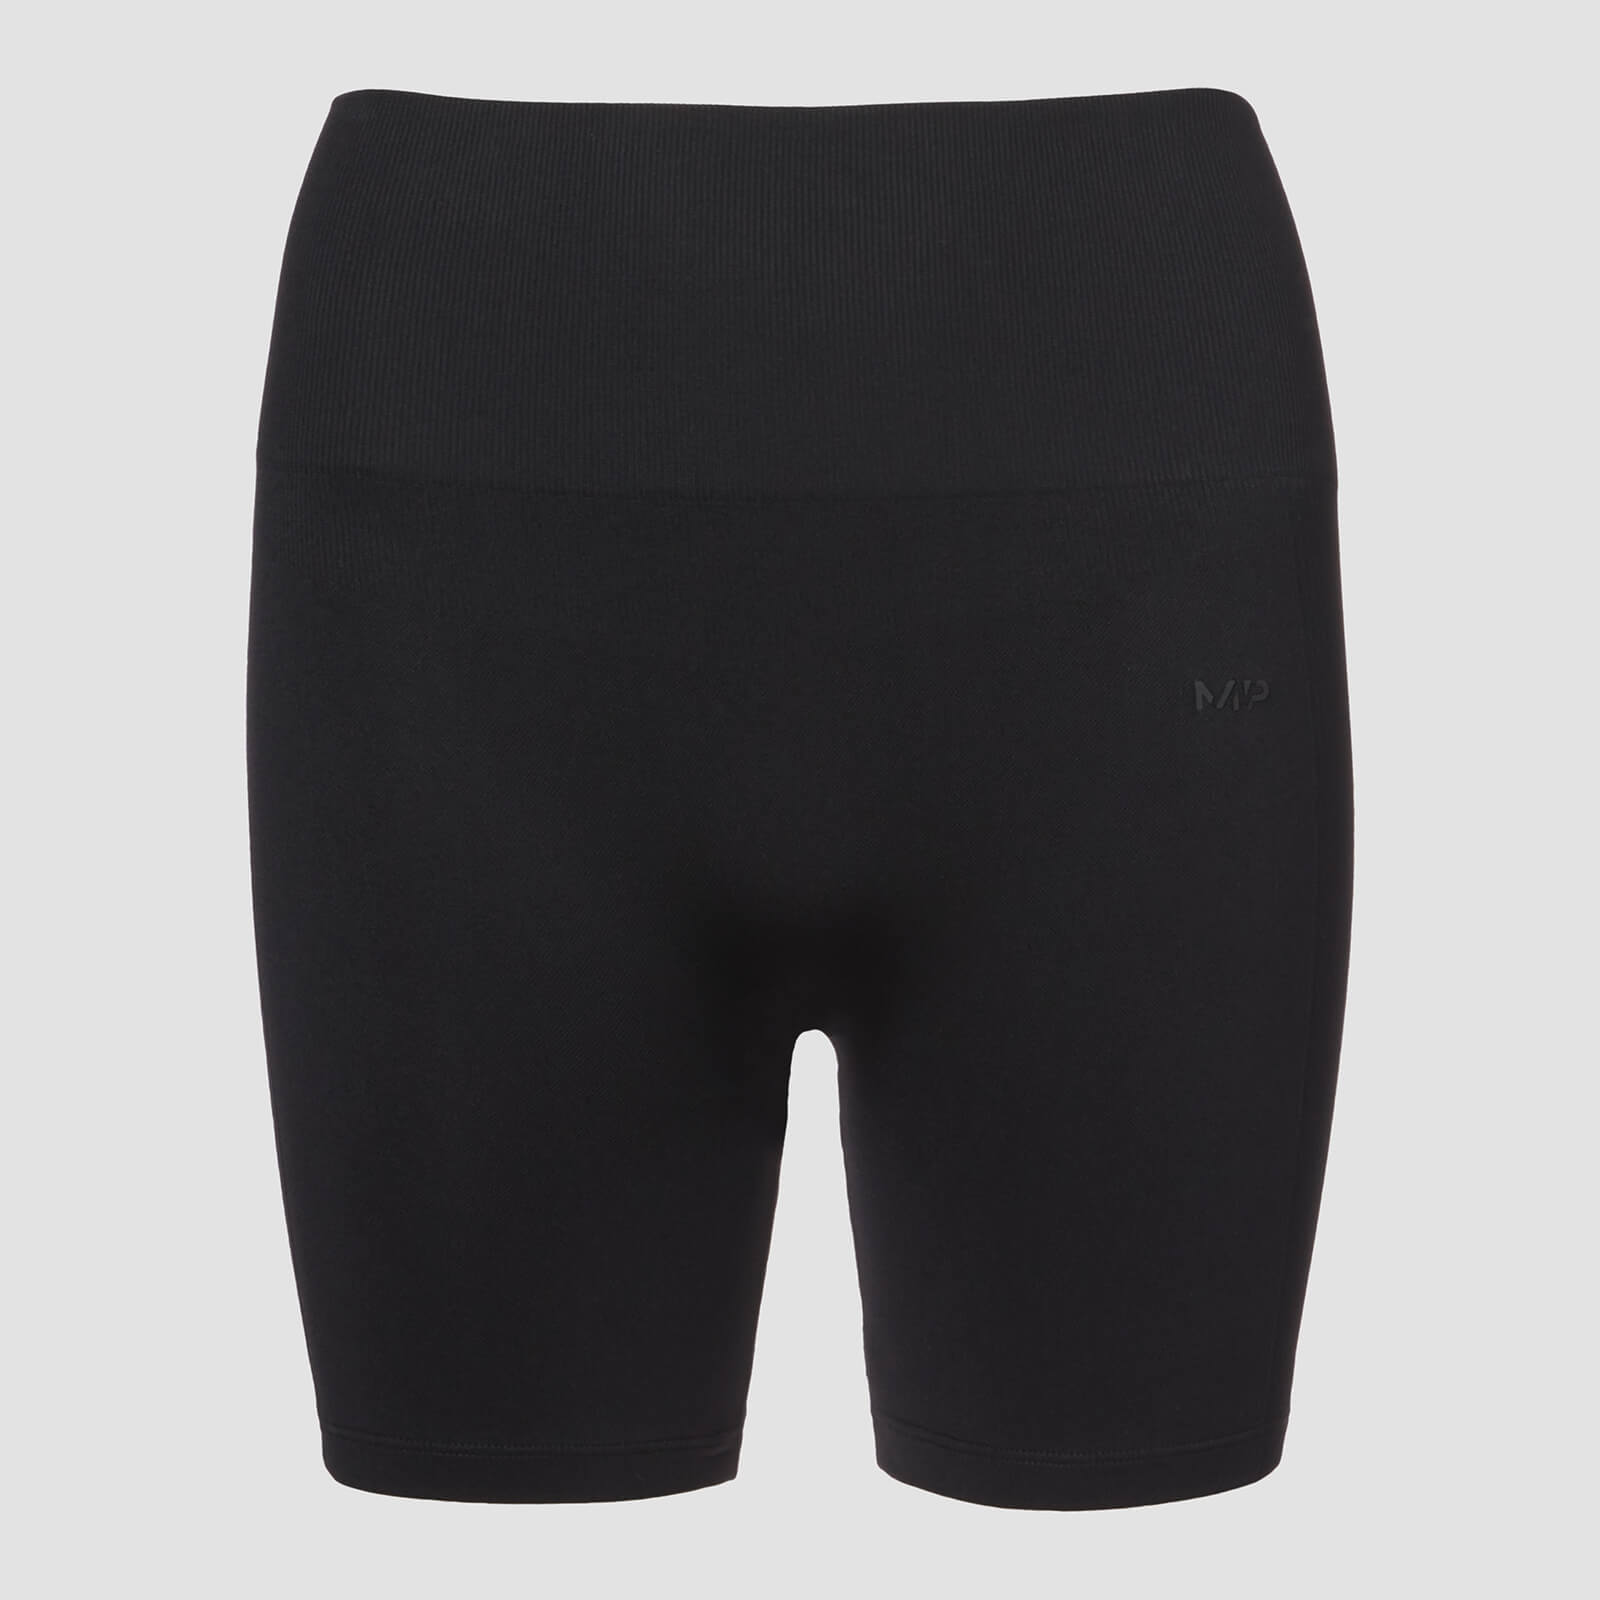 Shape Seamless Ultra Cycling Shorts - Schwarz - XS